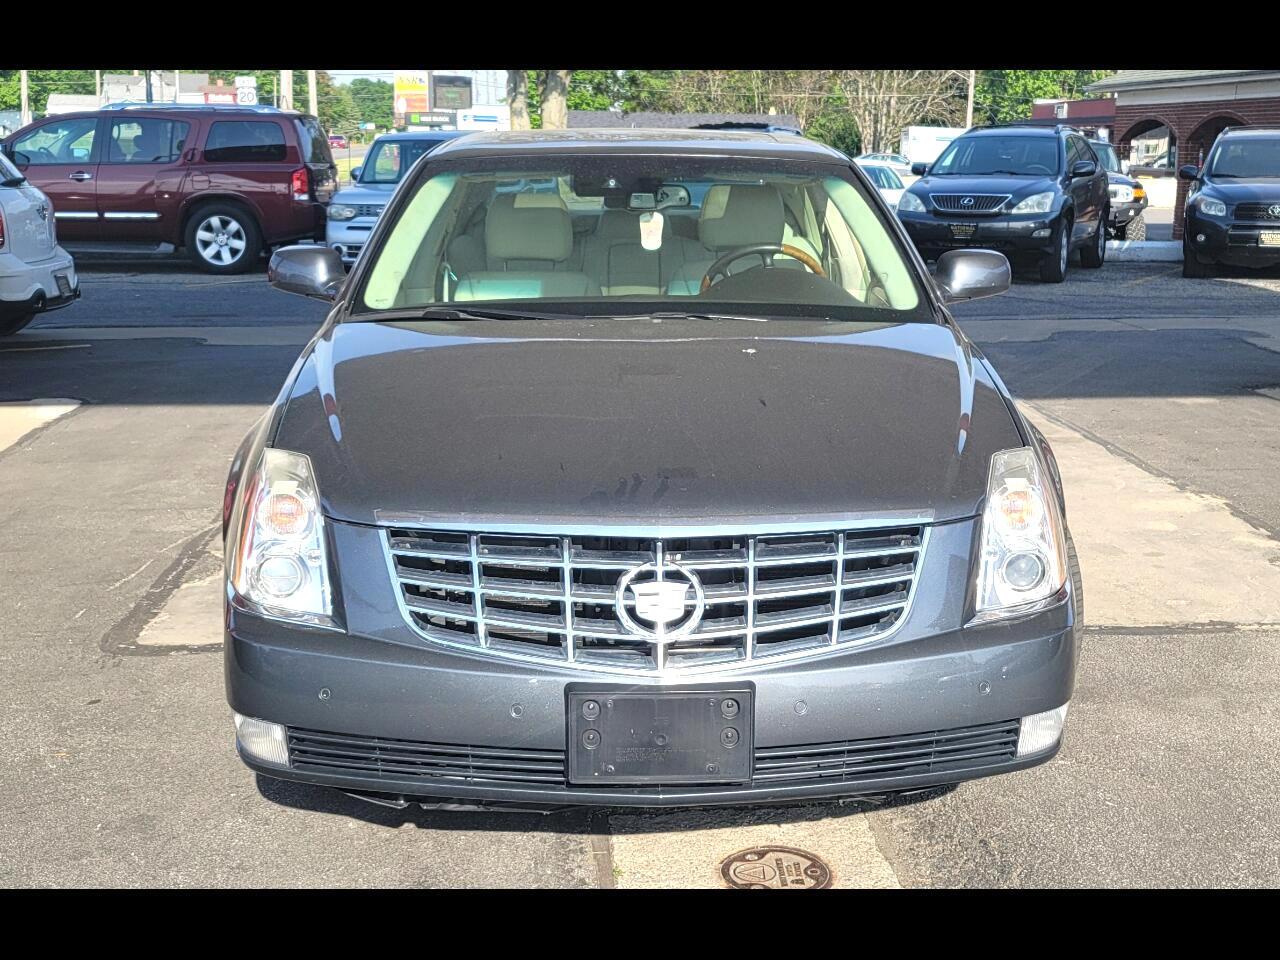 Cadillac DTS Platinum w/ Navi 2010